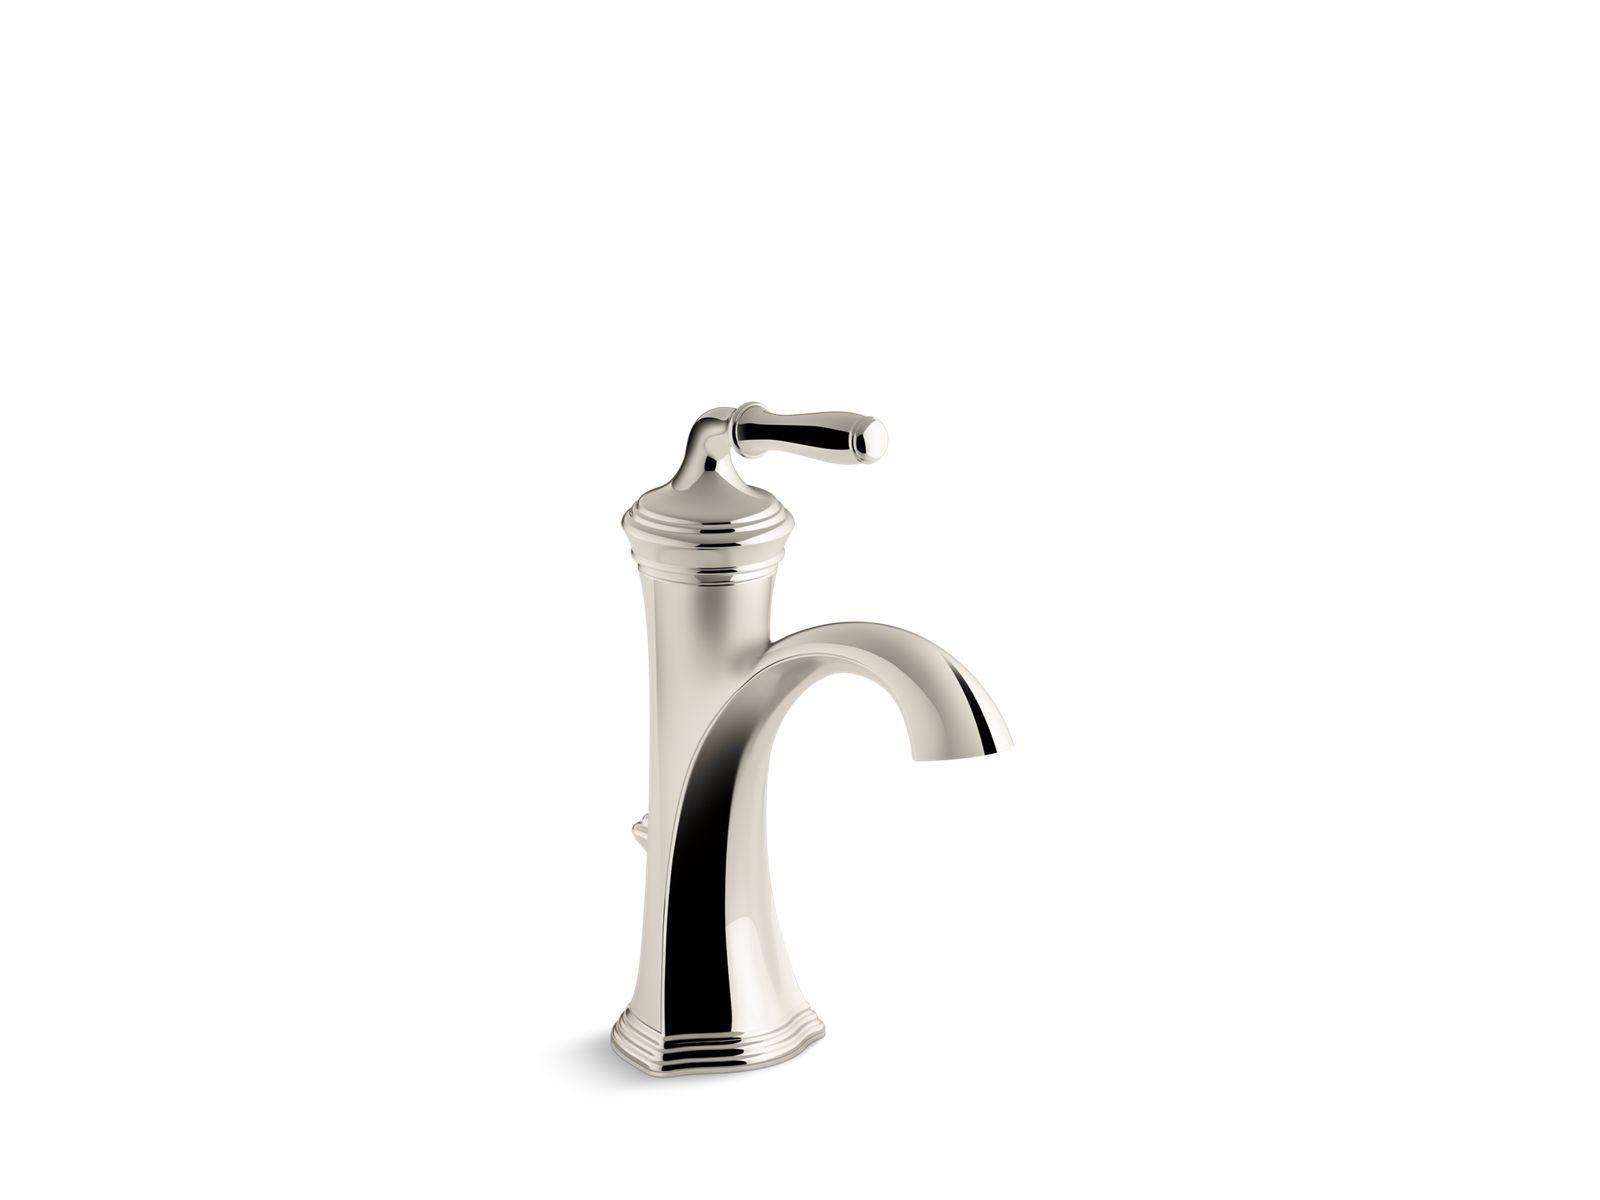 Devonshire Single Handle Bathroom Sink Faucet K 193 4 Kohler Bathroom Sink Faucets Bathroom Sink Faucets Single Hole Sink